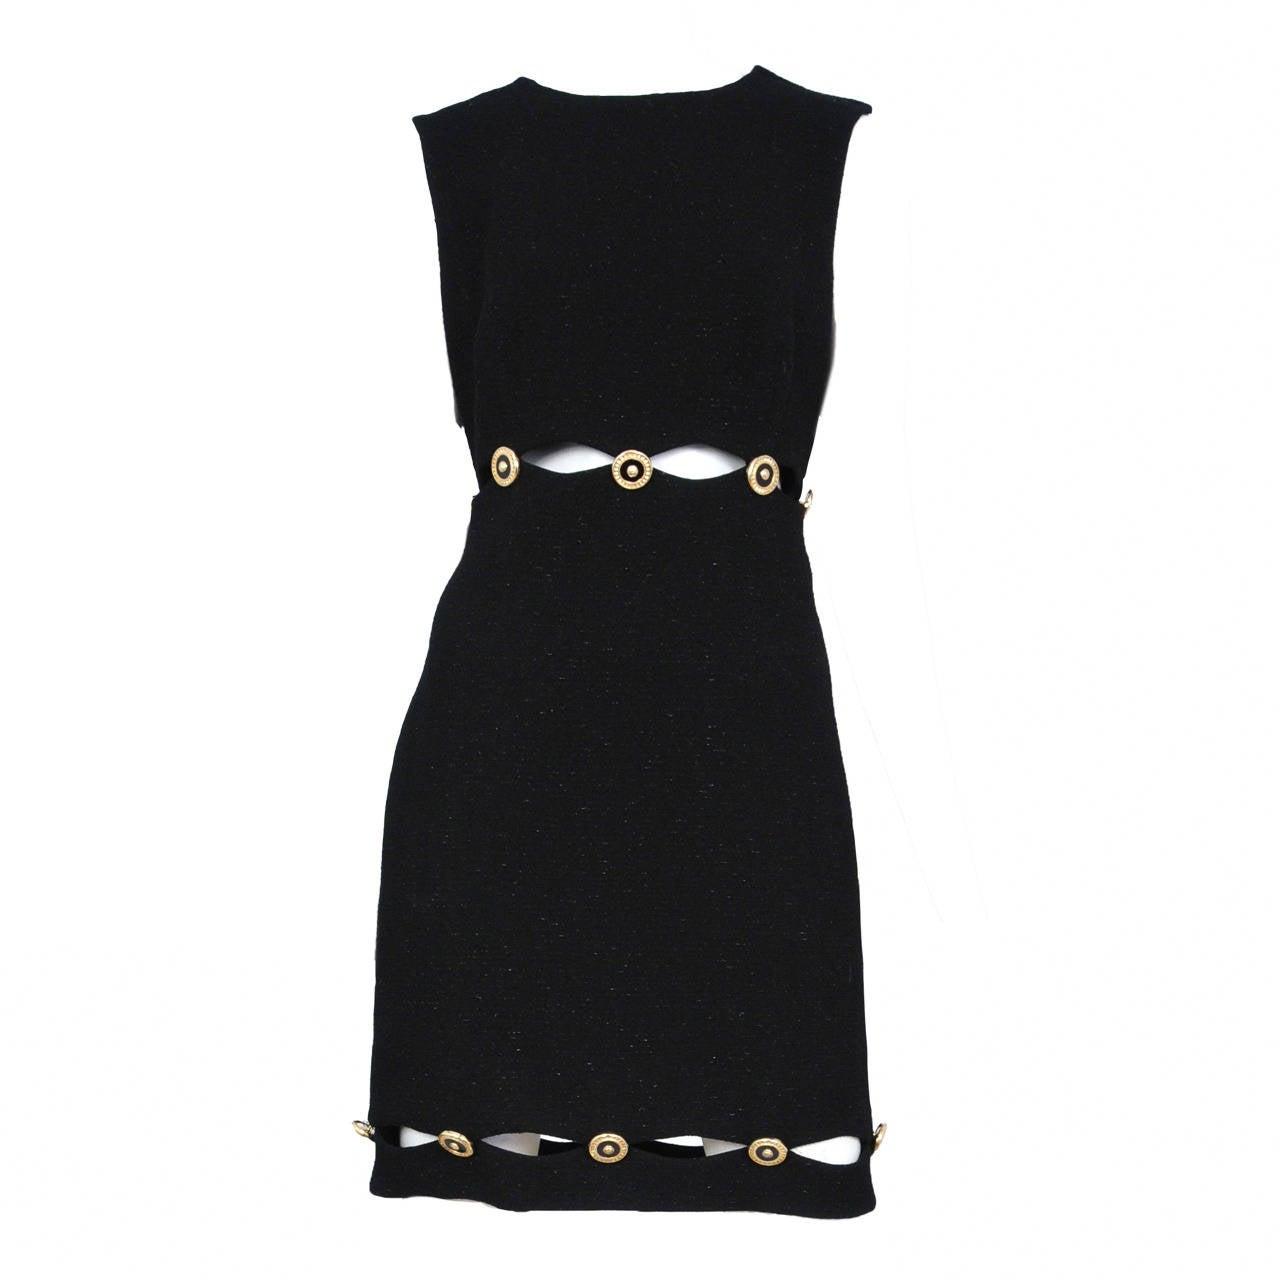 Versace Black slit medallion dress 1